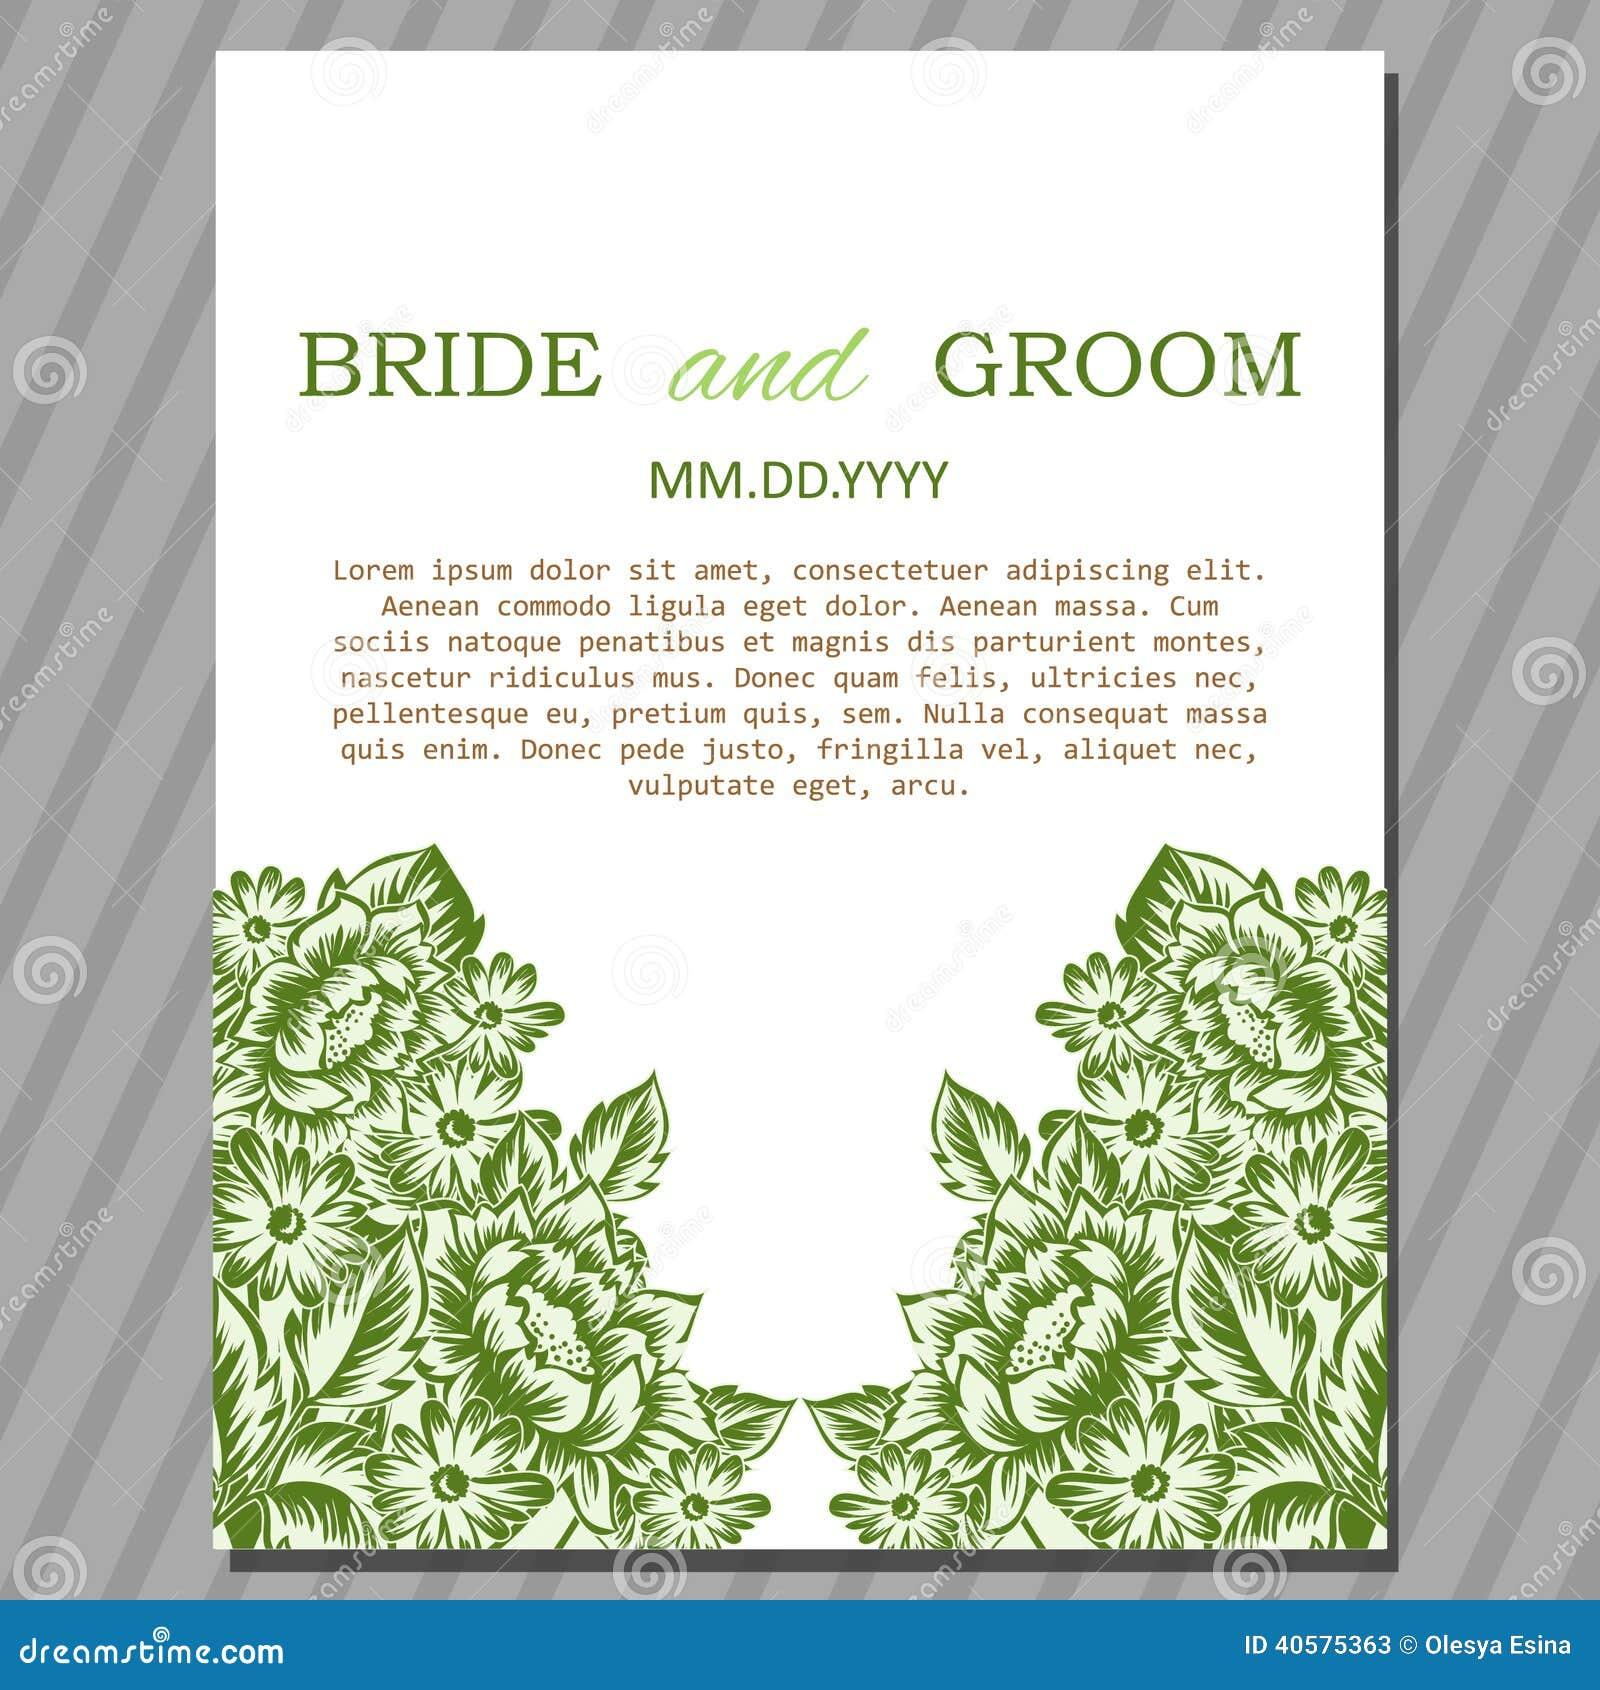 венчание иллюстрации карточки абстракции